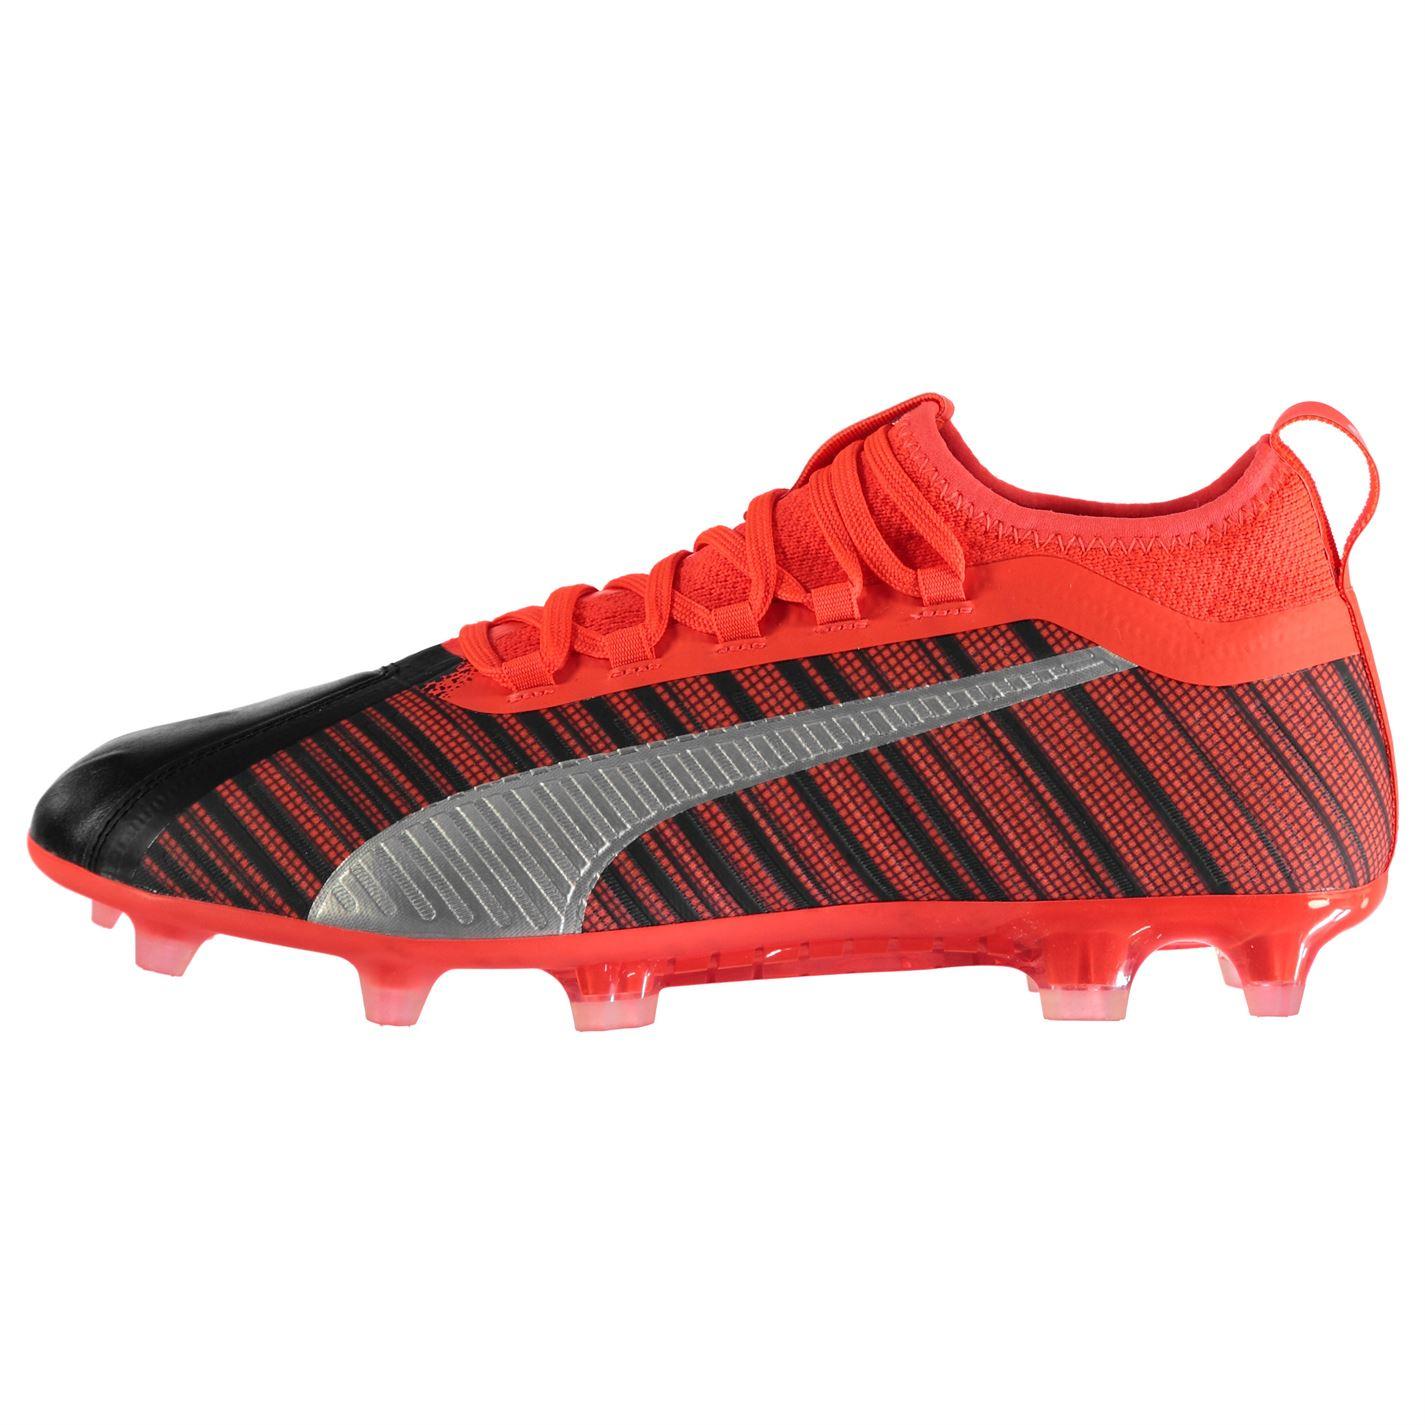 Puma One 5.2 Mens FG Football Boots